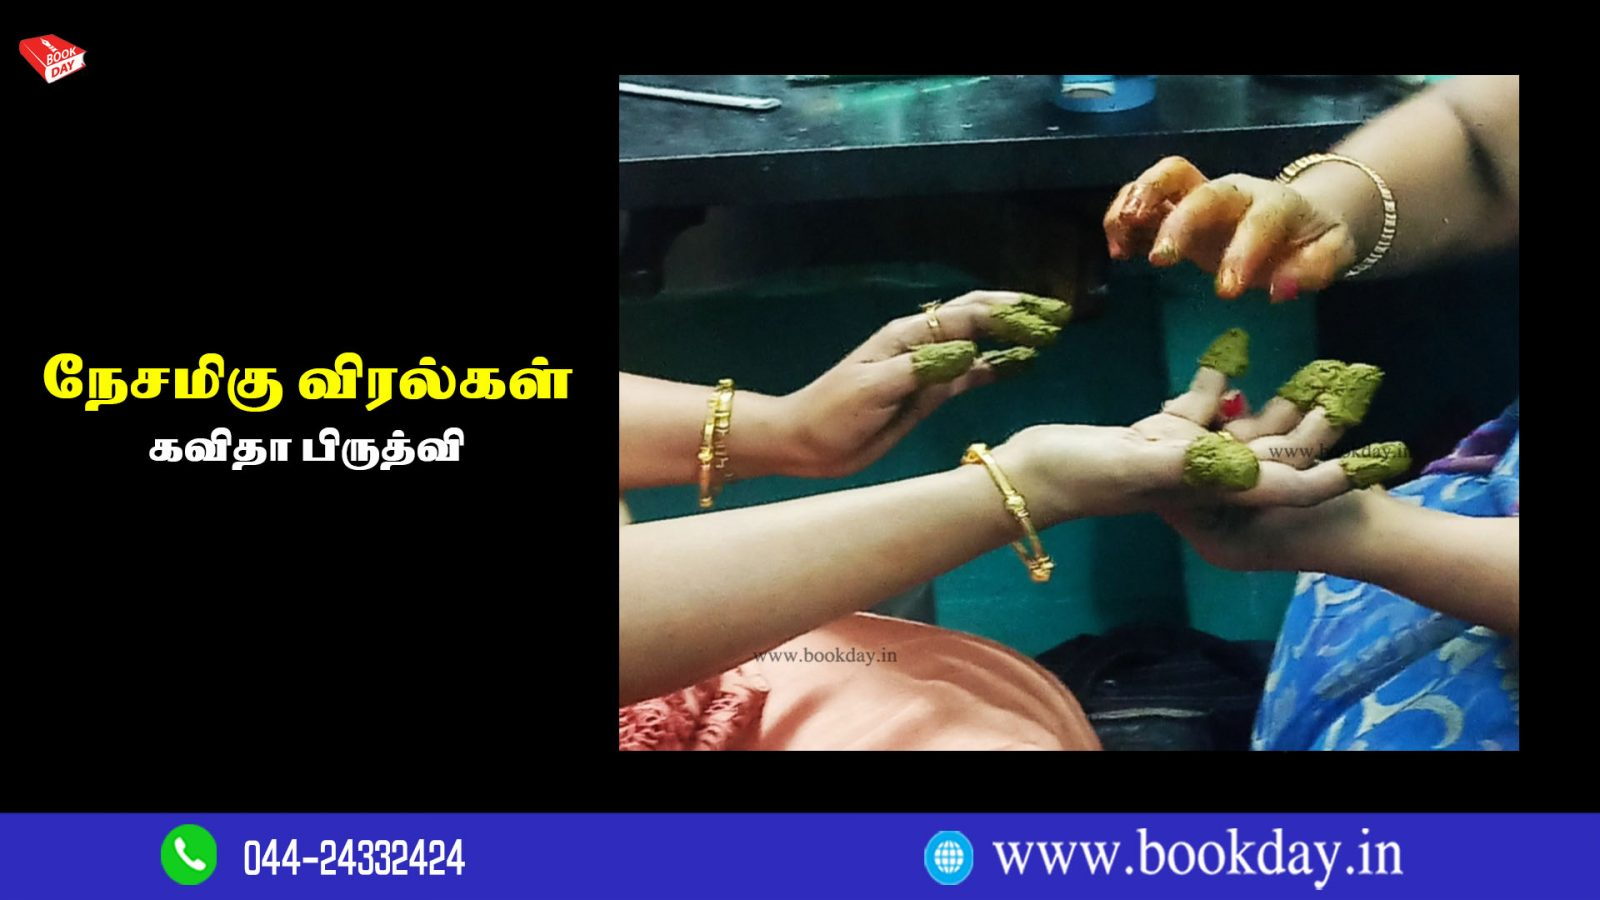 Nesamigu Viralgal Poetry By Kavitha Prithivi. நேசமிகு விரல்கள் - கவிதா பிருத்வி. Book Day is Branch of Bharathi Puthakalayam